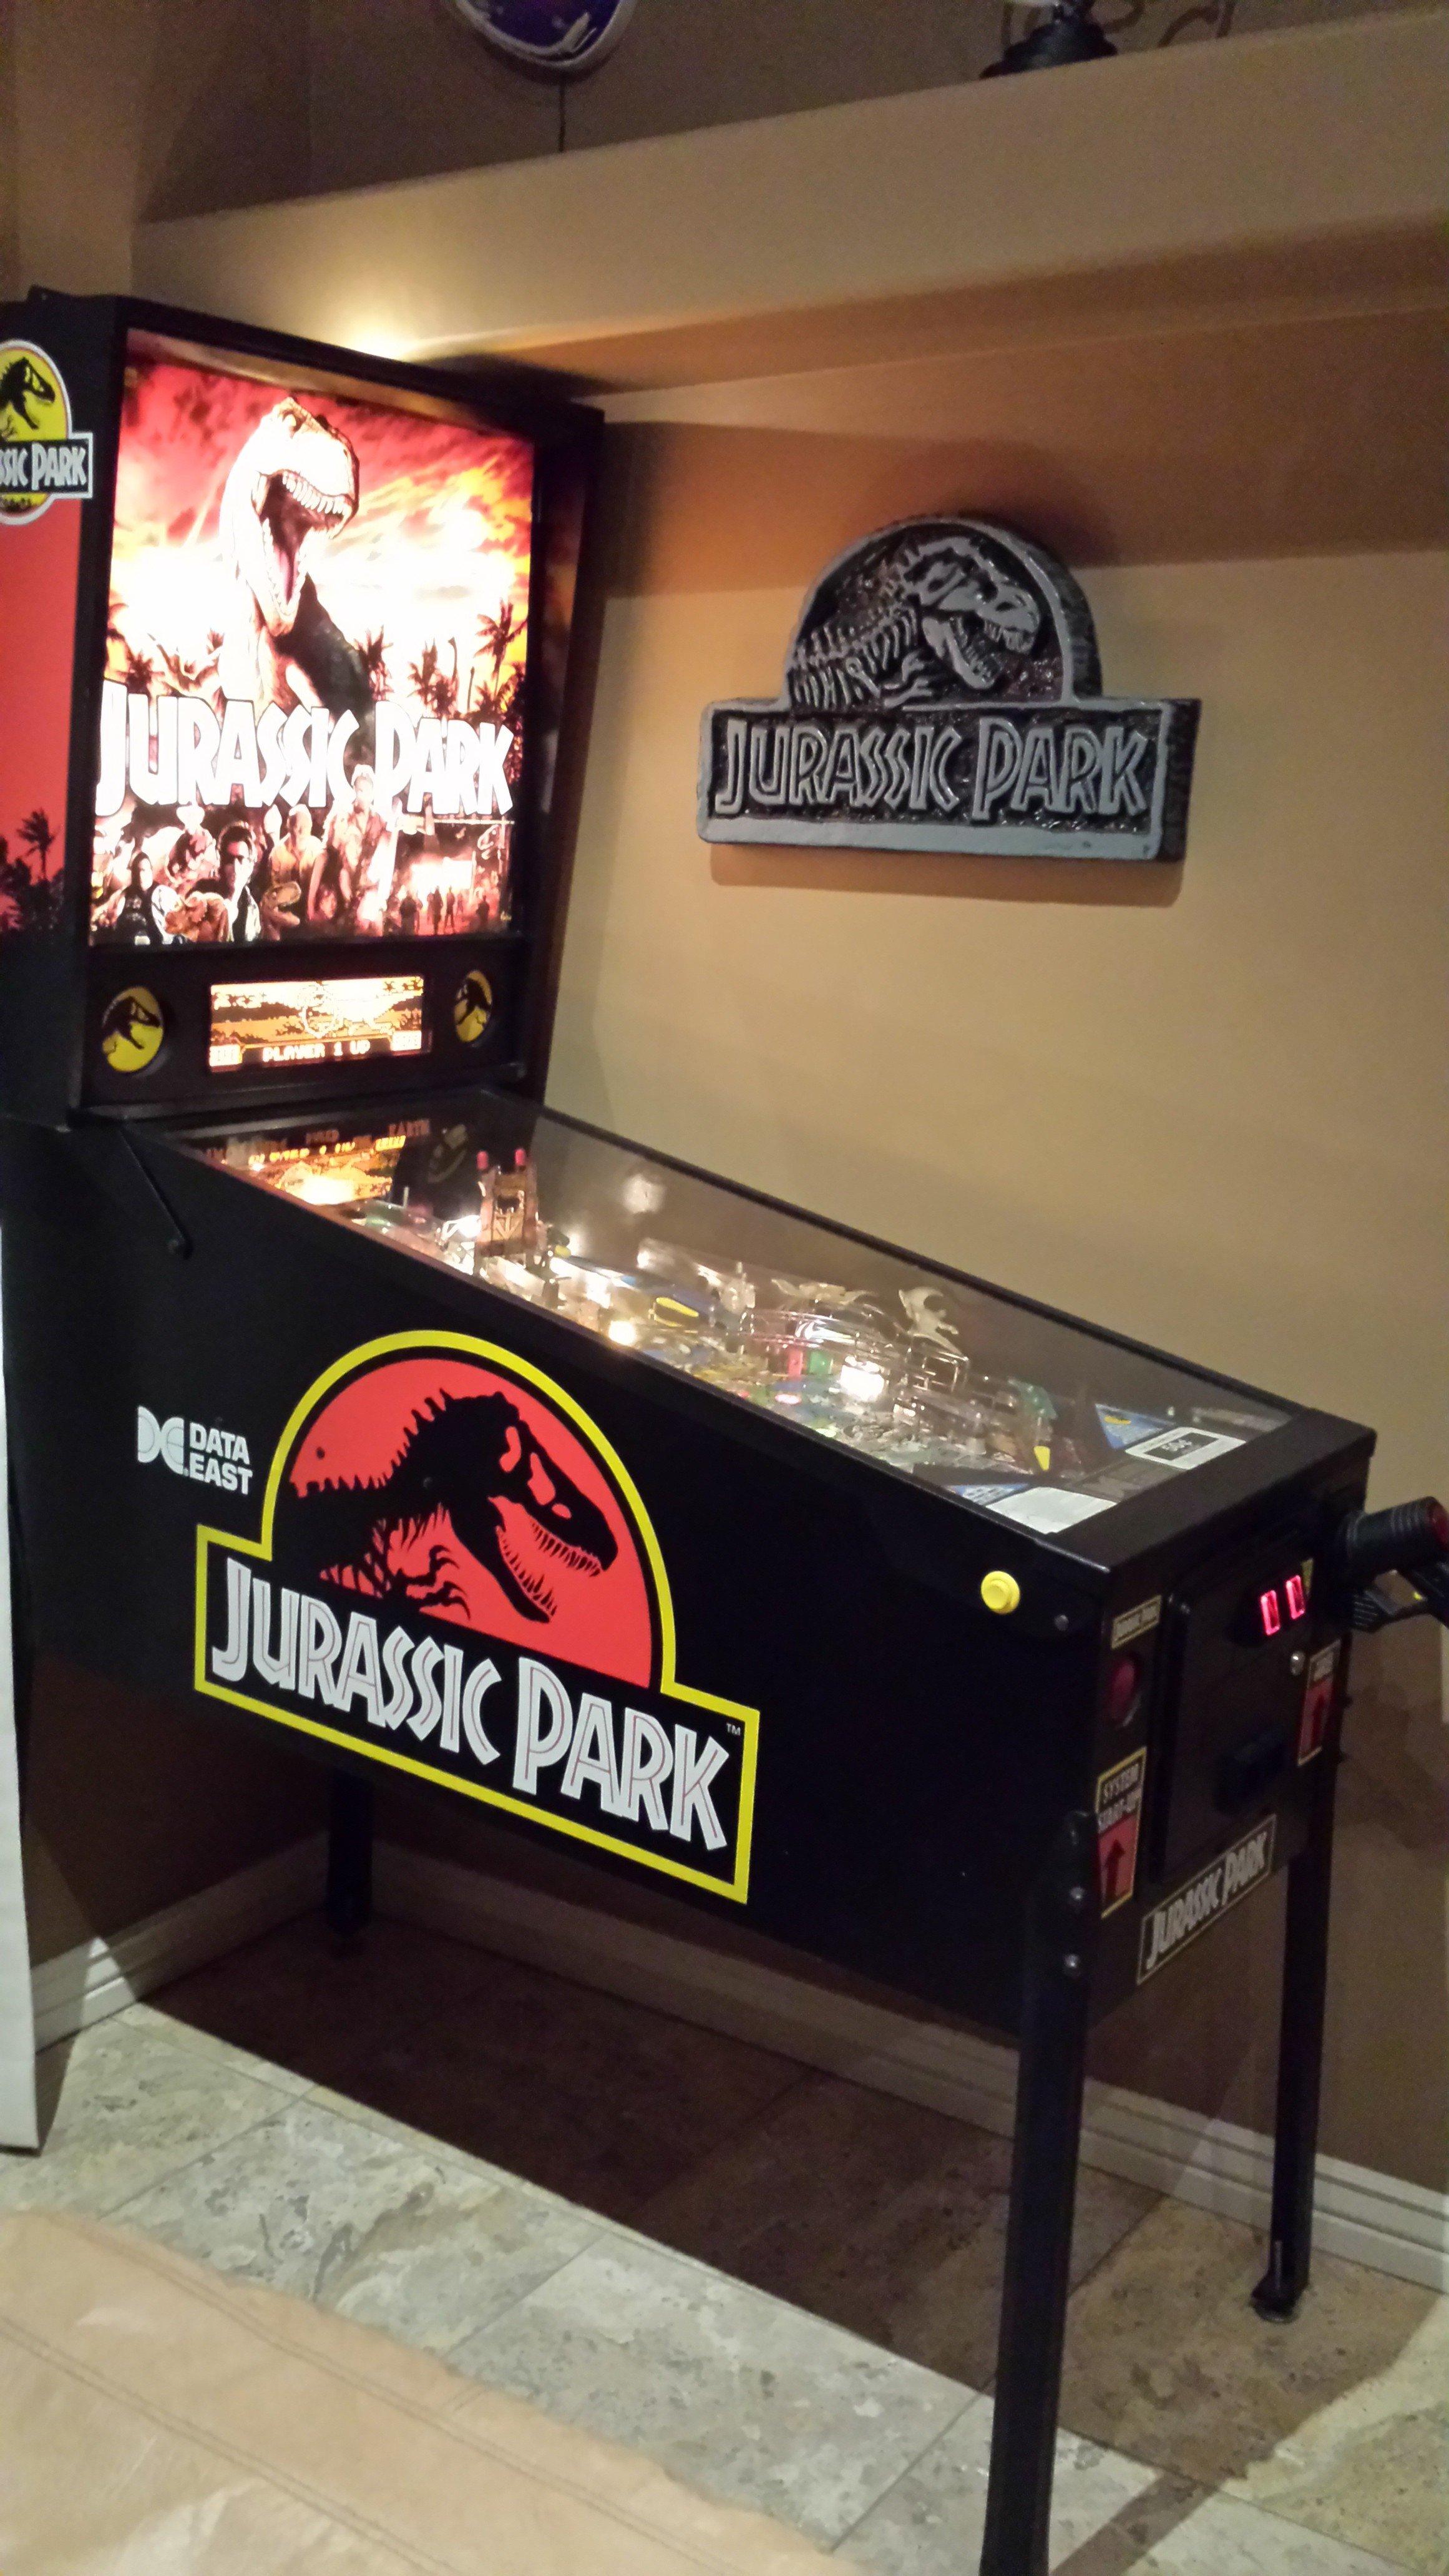 Jurassic Park pinball machine for sale in Scottsdale, Arizona